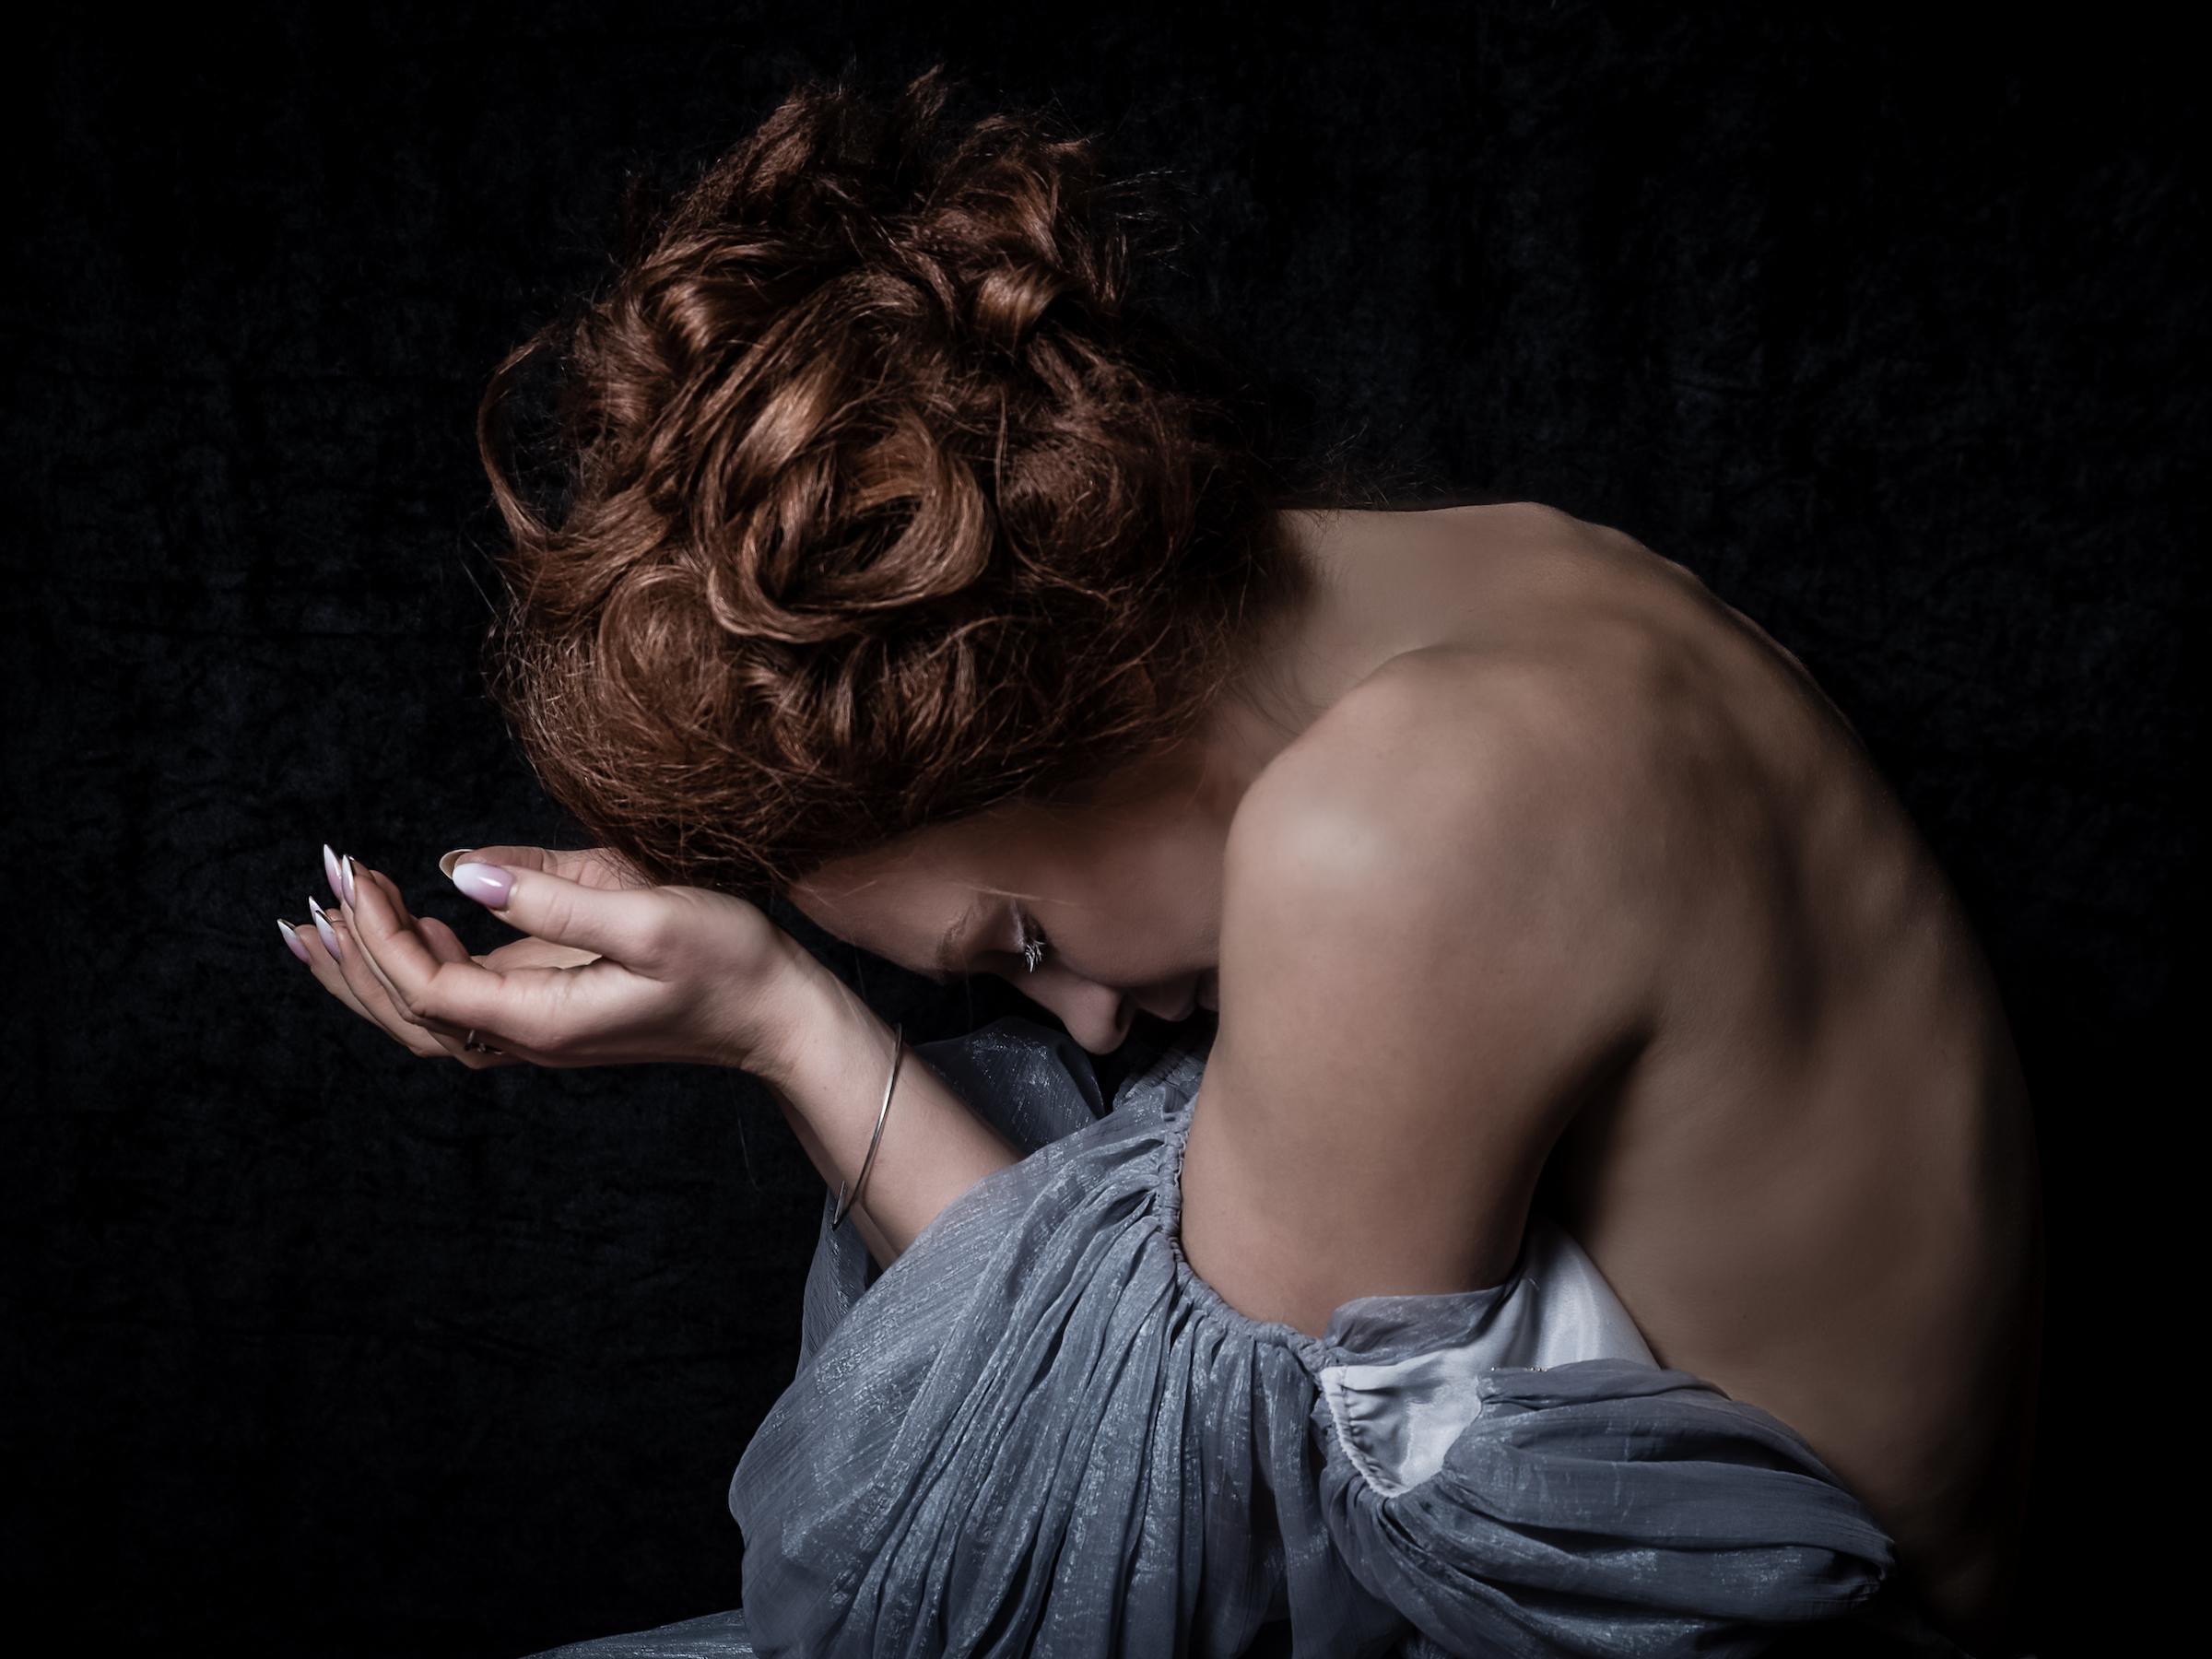 Tiina Poimio: Despair